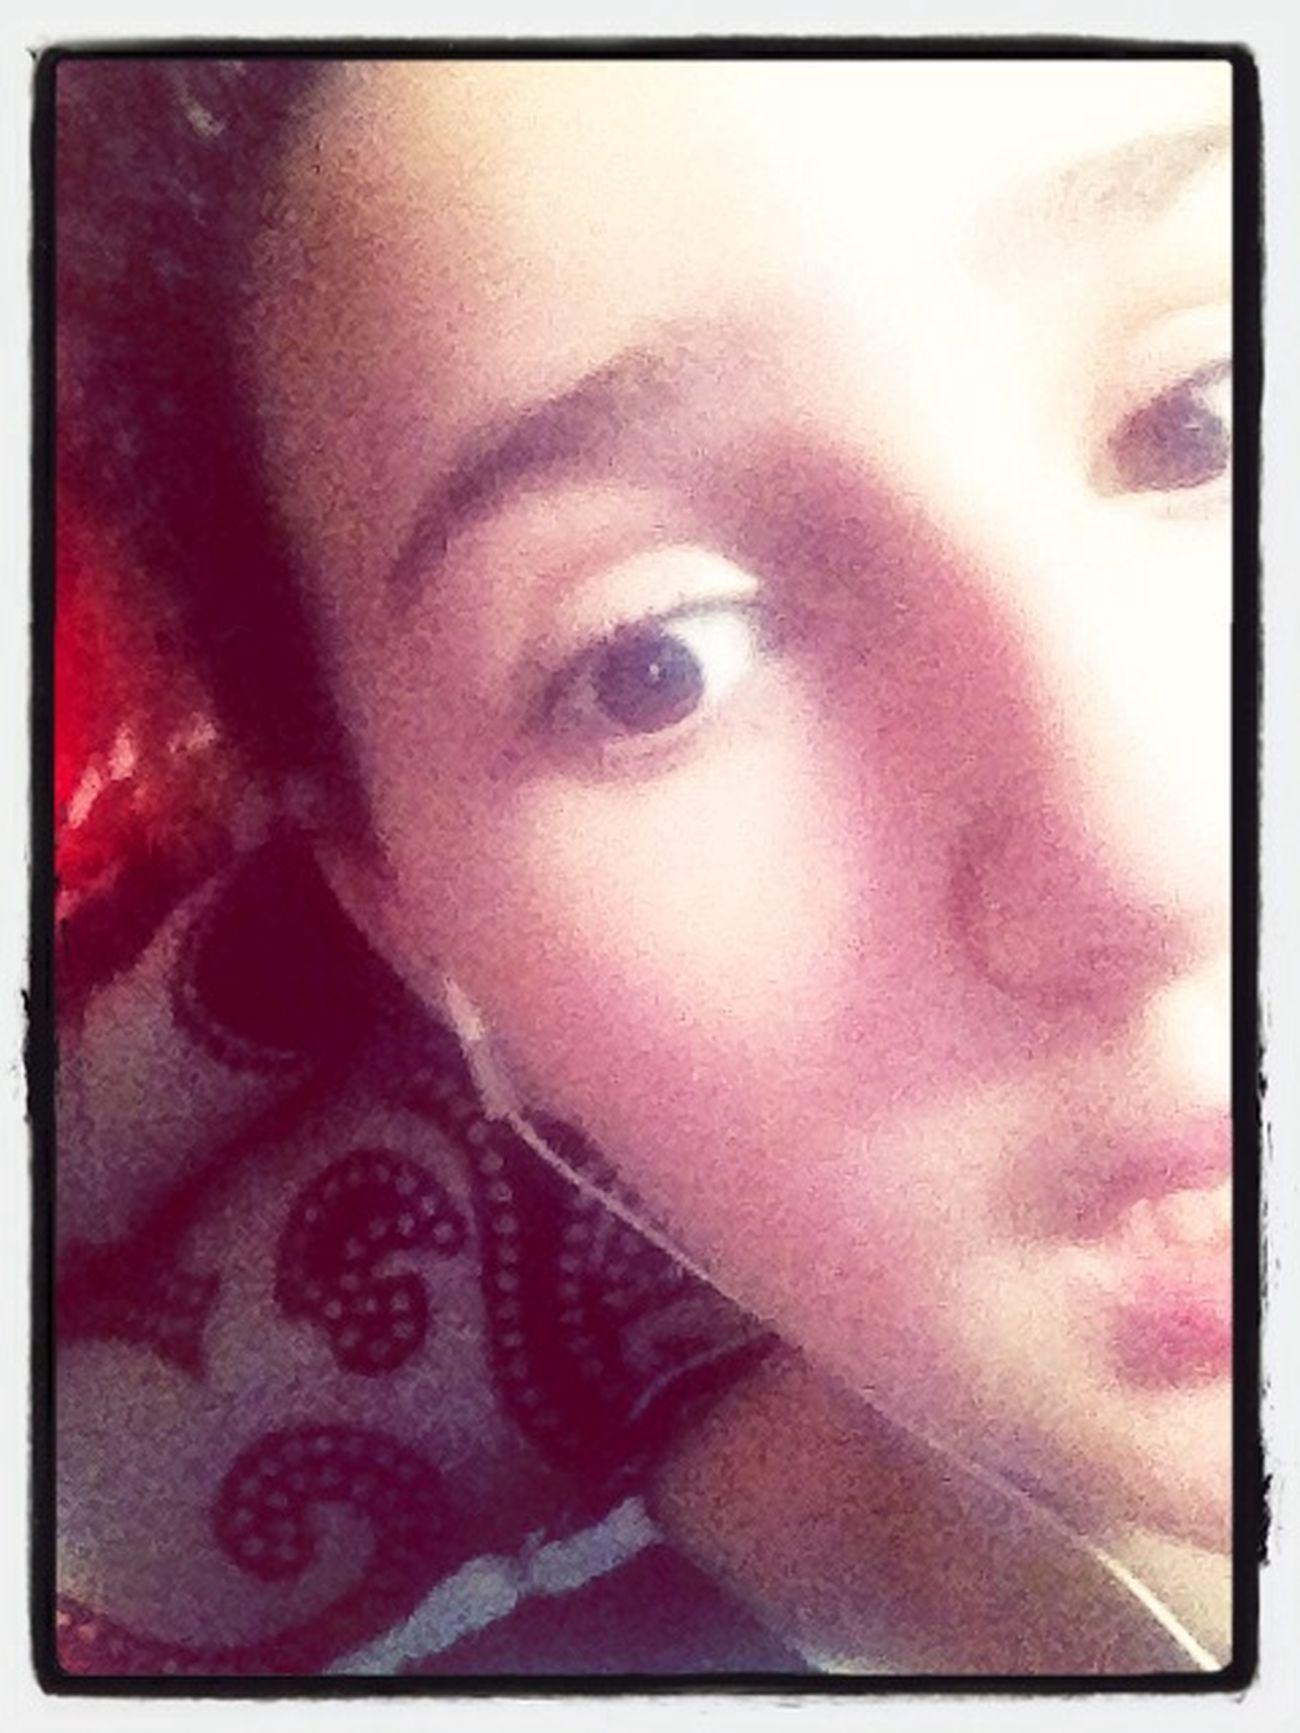 Hello tous le monde